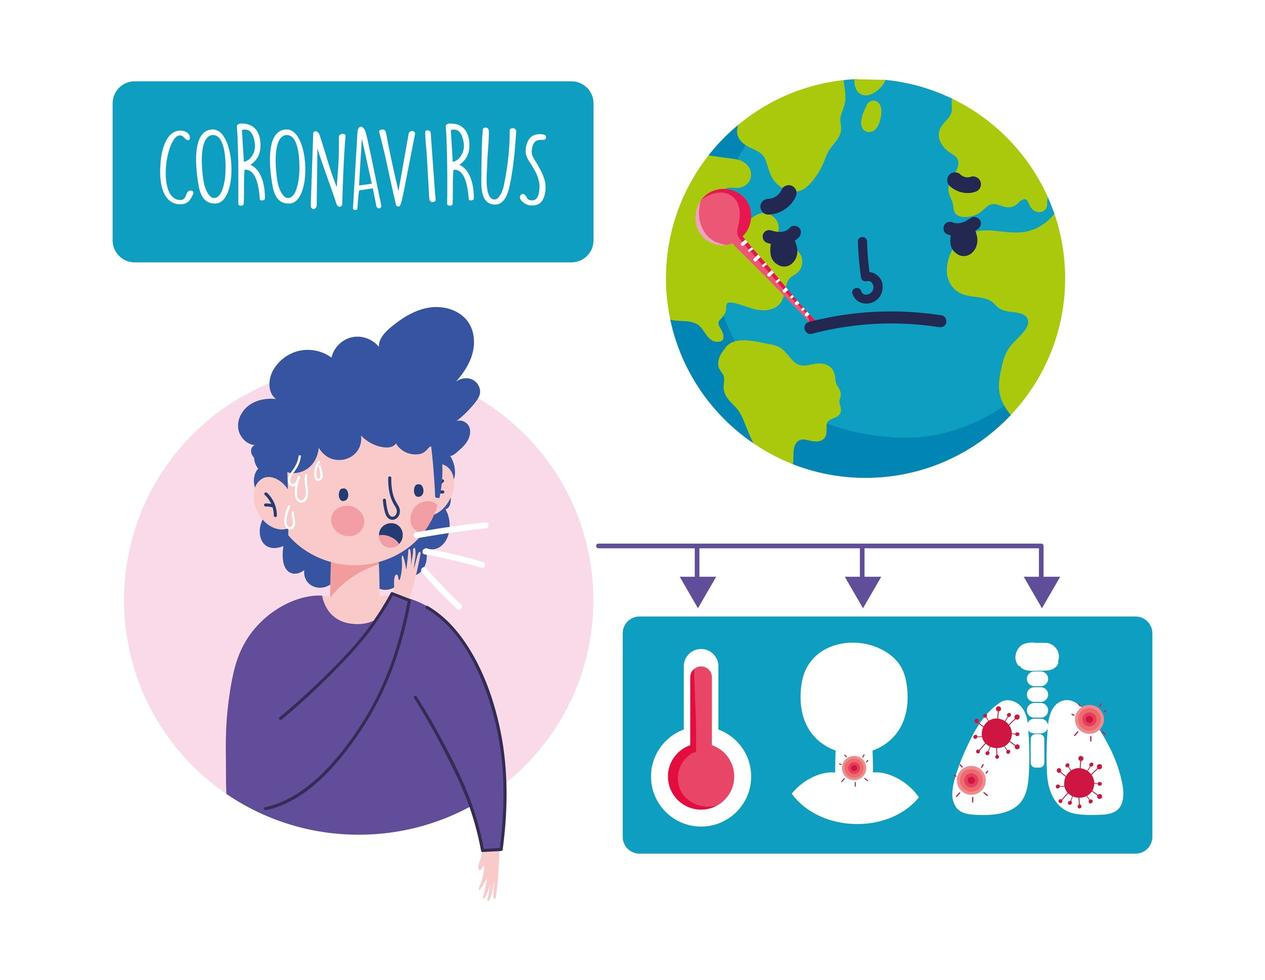 Young man with coronavirus symptoms infographic vector